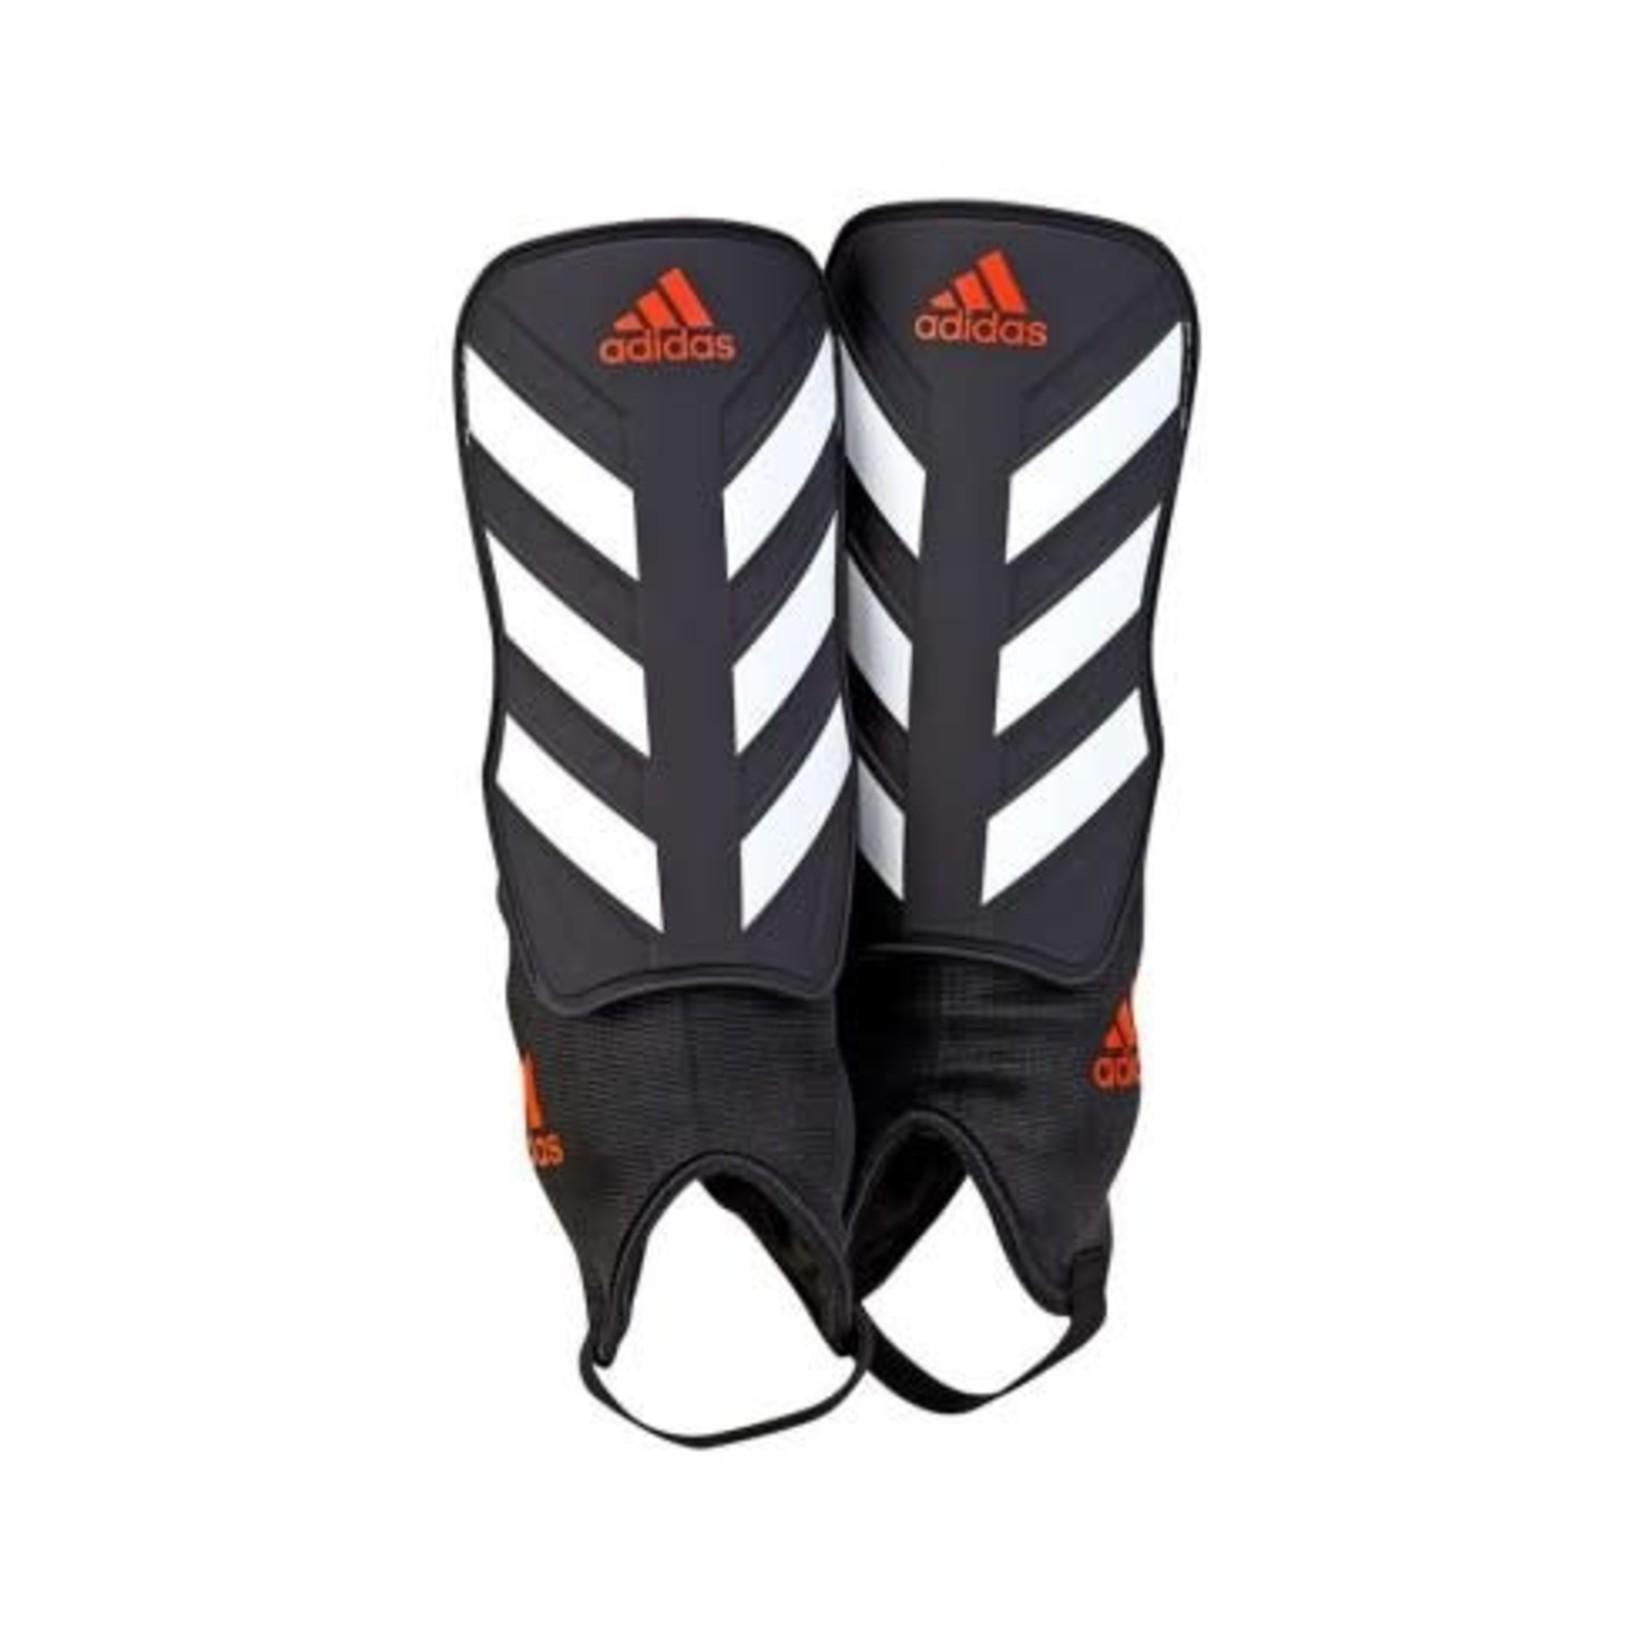 Adidas Adidas Soccer Shin Pads, Everclub, Adult